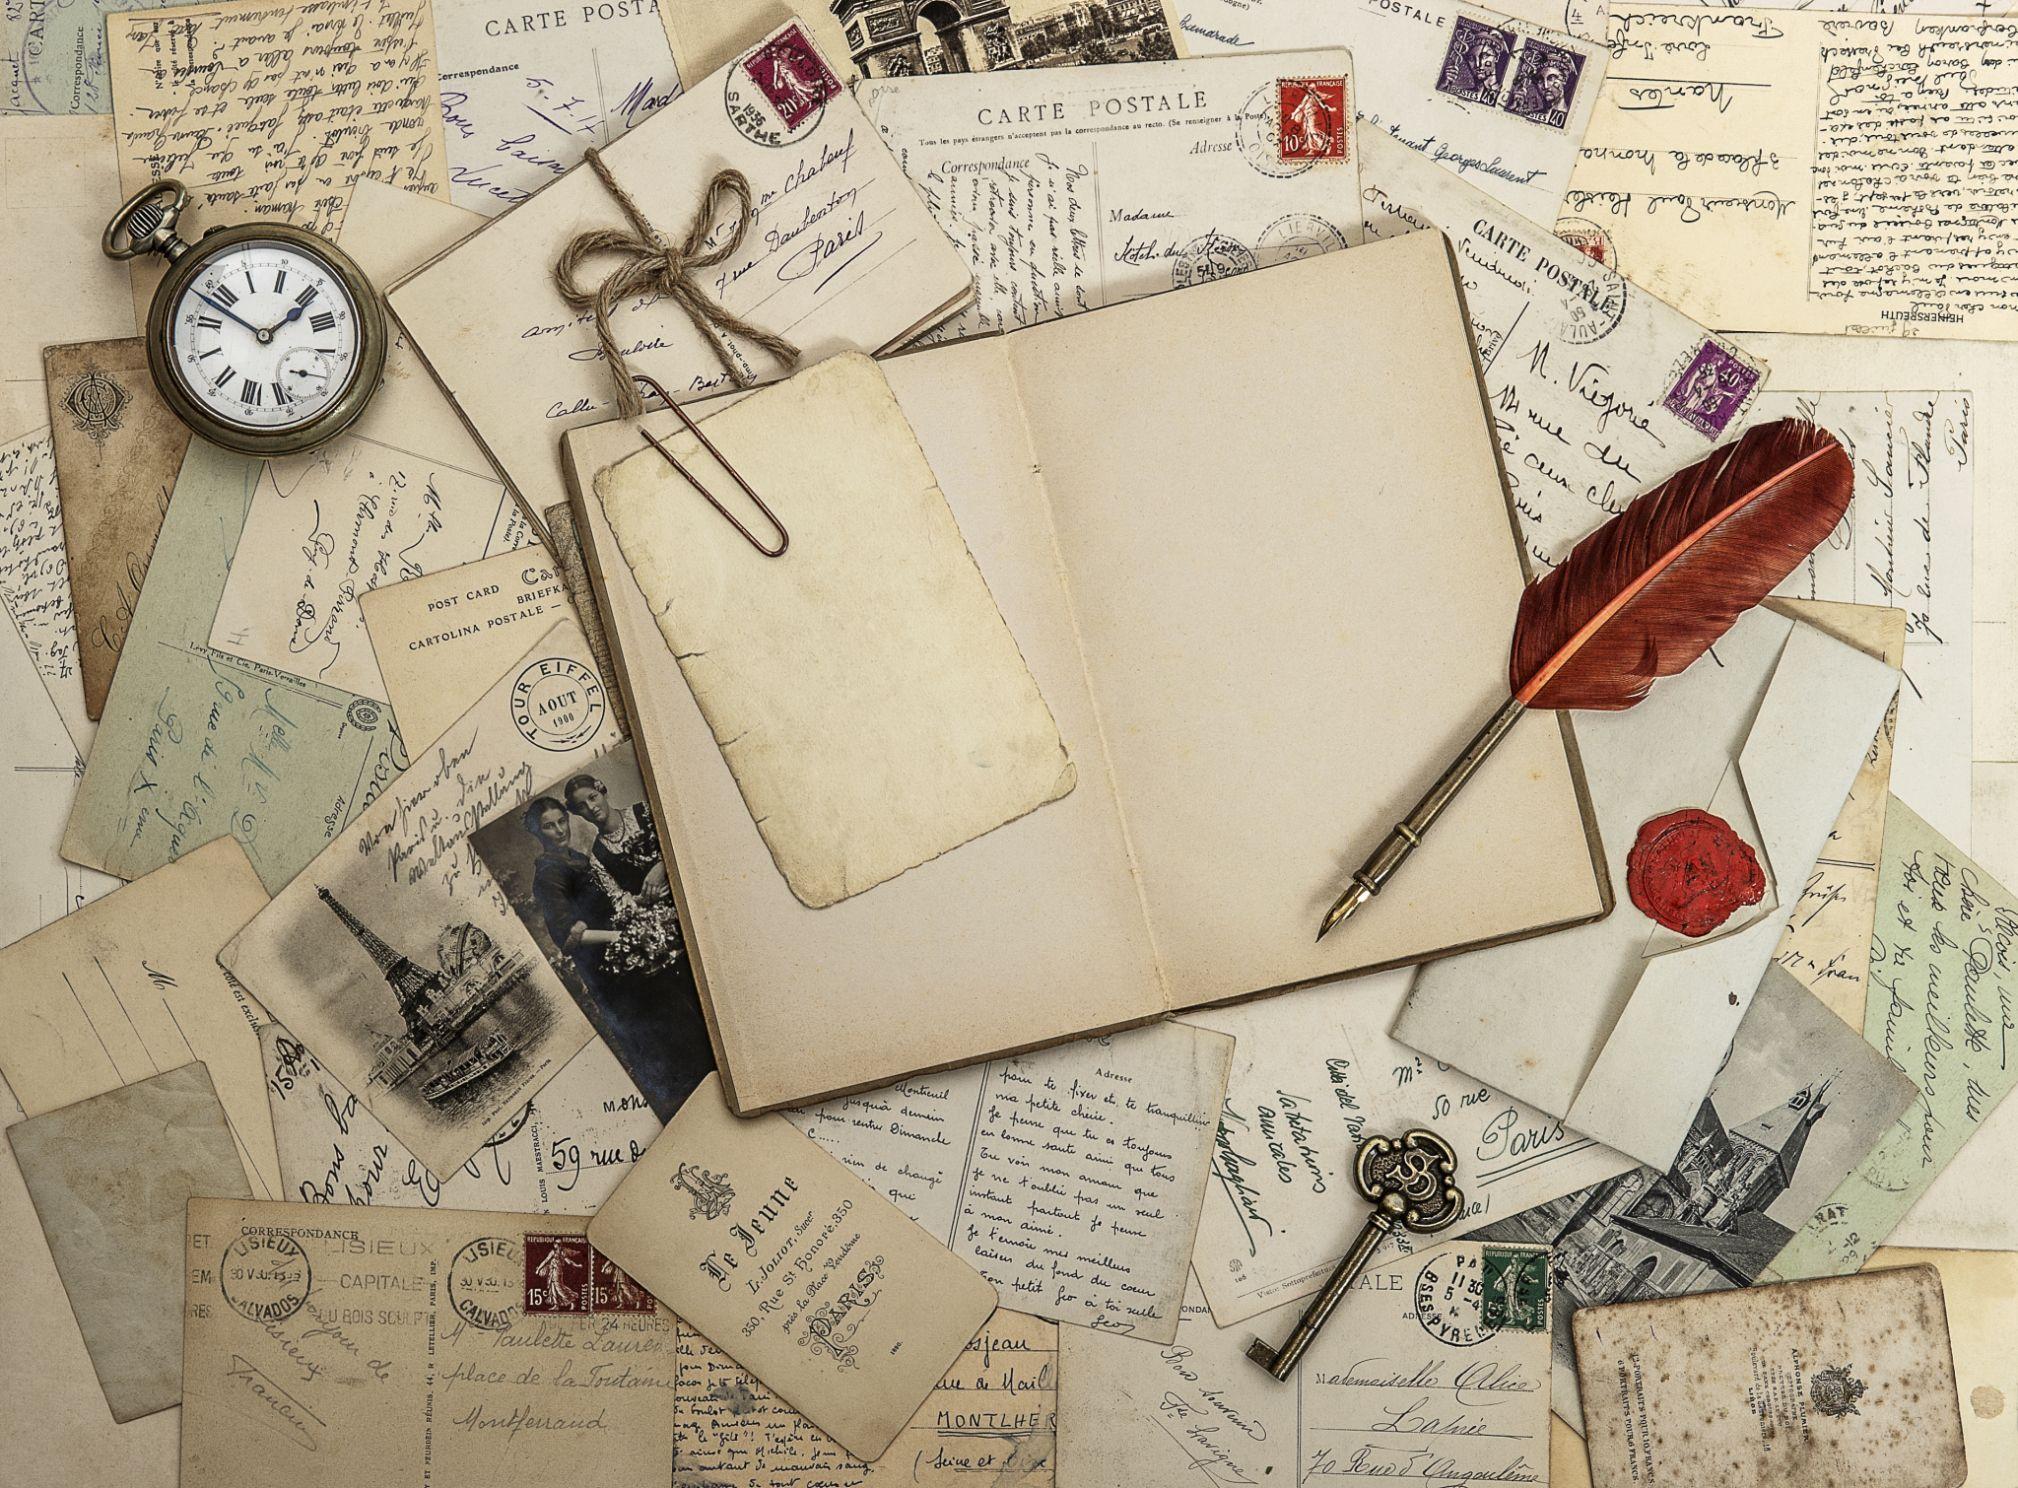 10 Tips for Genealogy Scrapbooking | Genealogy | Pinterest